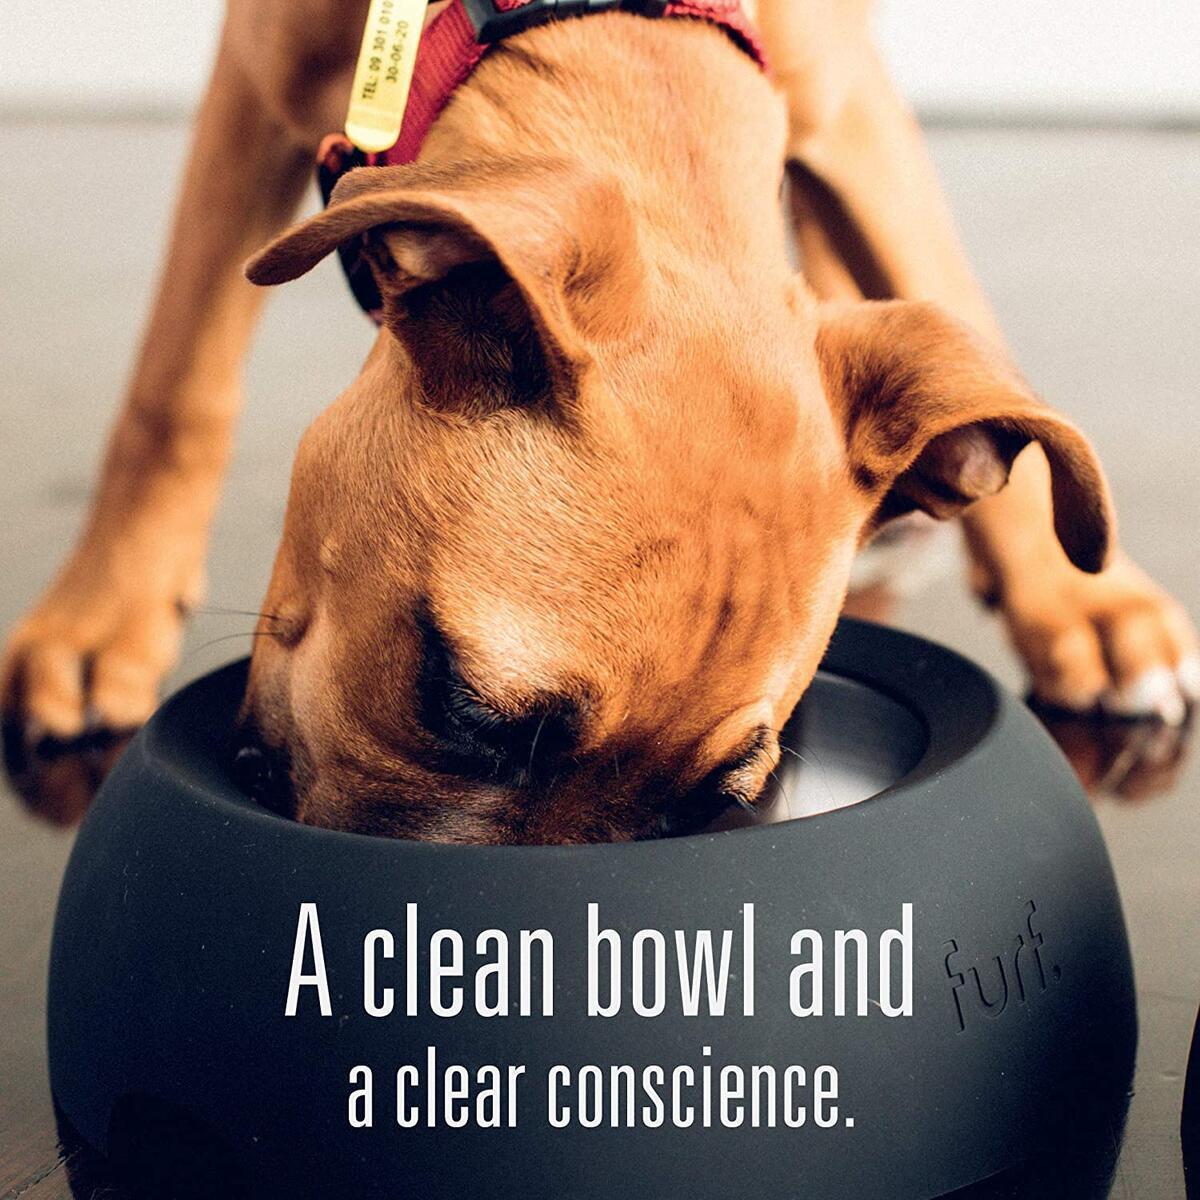 Meat Mates BPA-Free & Gelatin-Free Canned Dog Food - Lamb Dinner